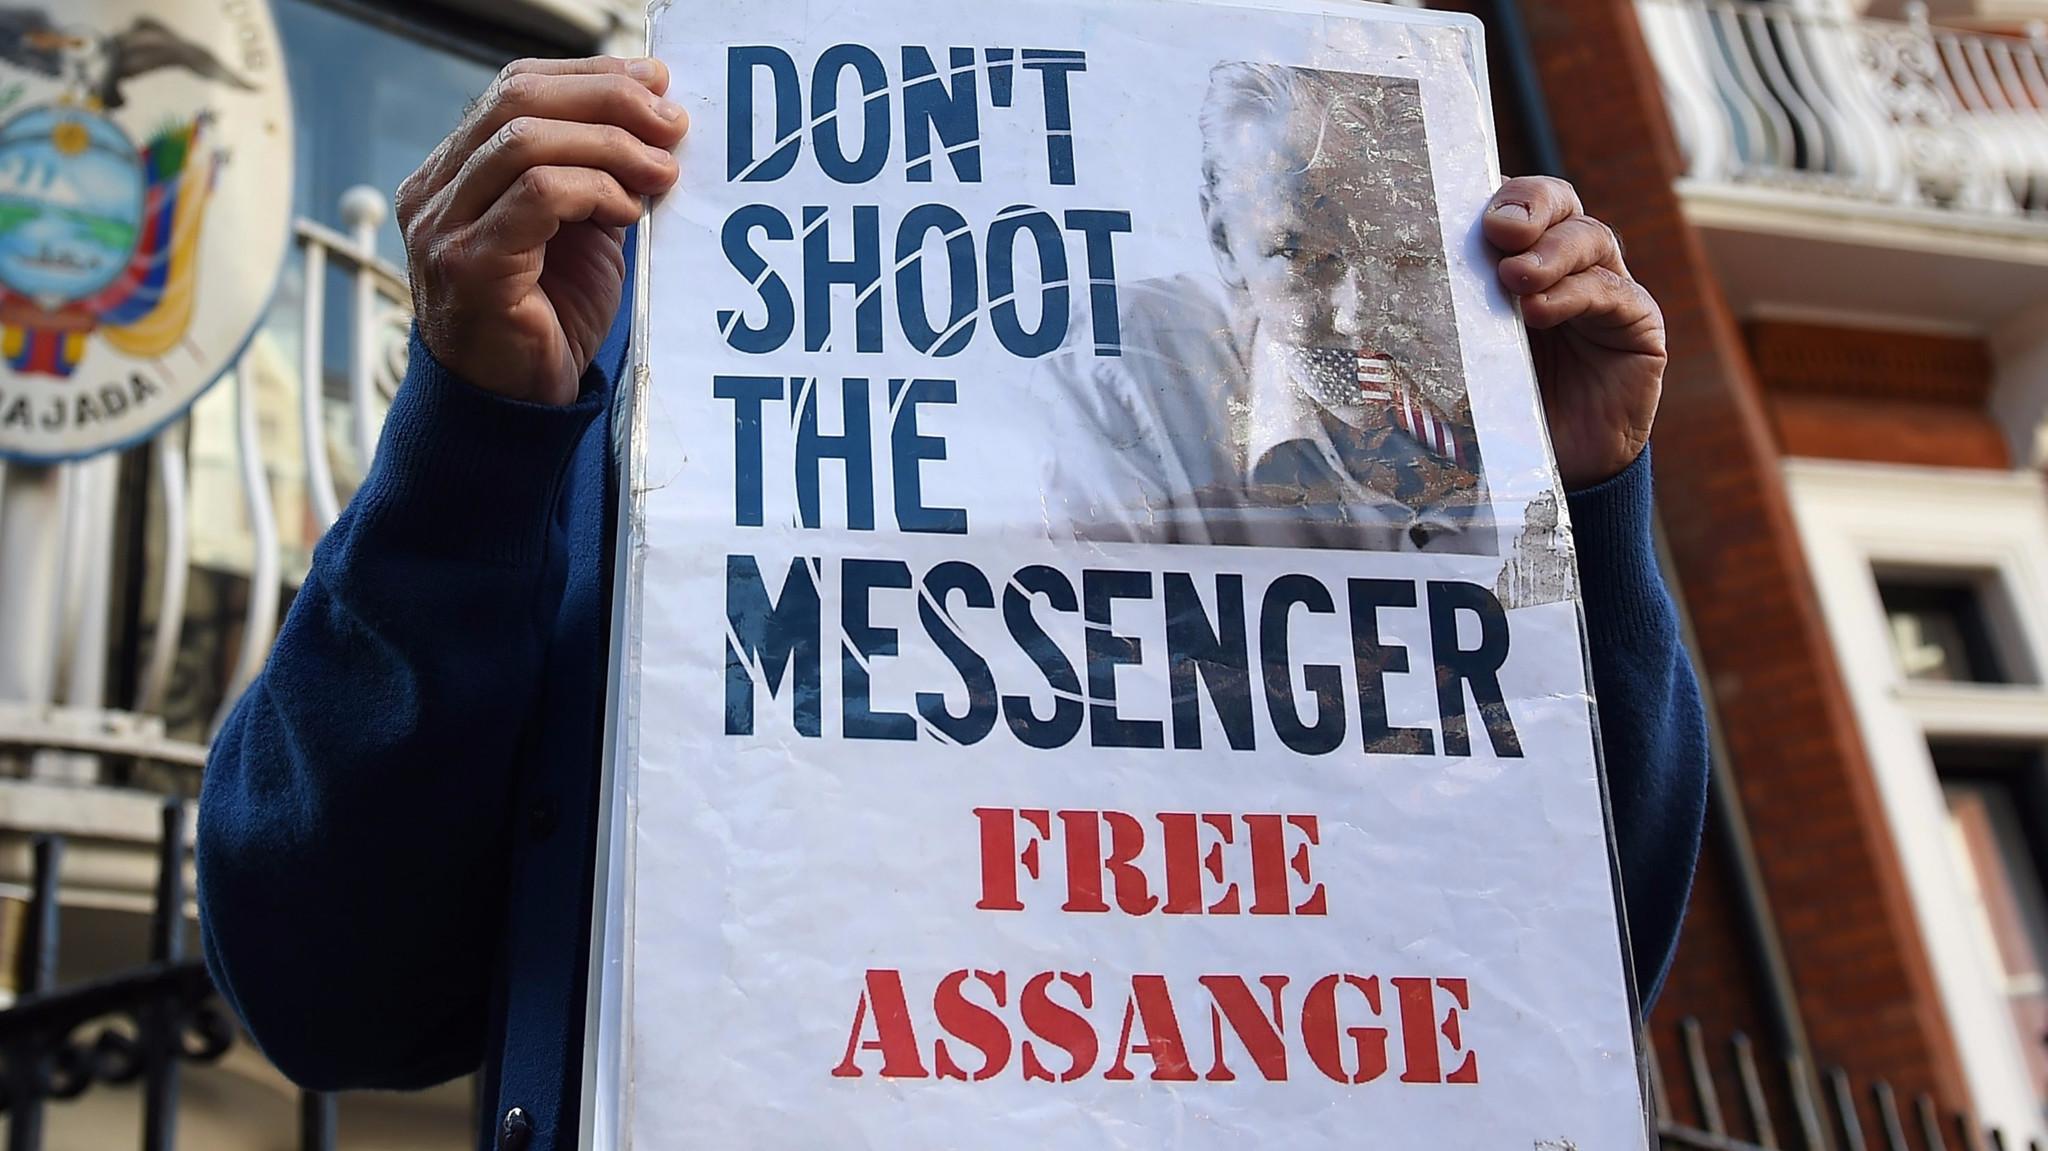 live leaks wiki wikileaks julian assange whistleblowing outfit  what the wikileaks emails tell us about hillary clinton la times wiki leaks